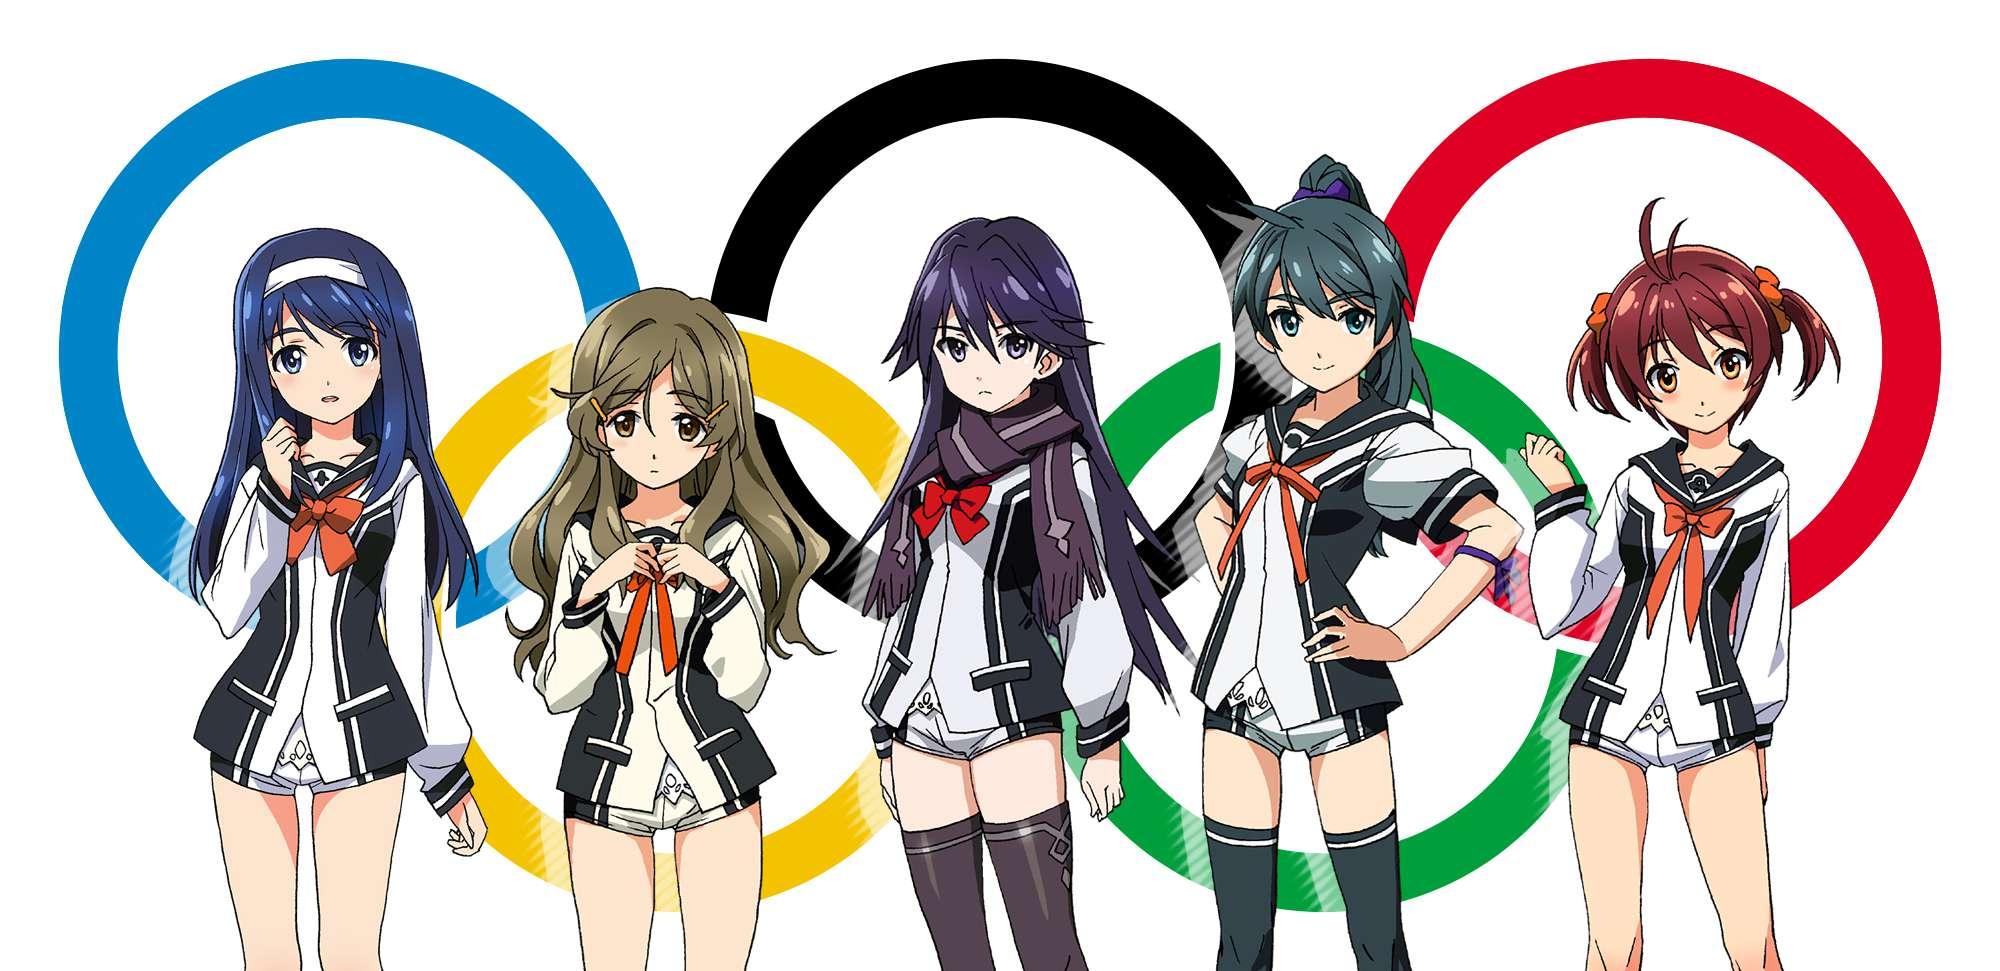 Ilustrasi para gadis dari seri anime vividred operation dengan logo olimpiade a 1 pictures